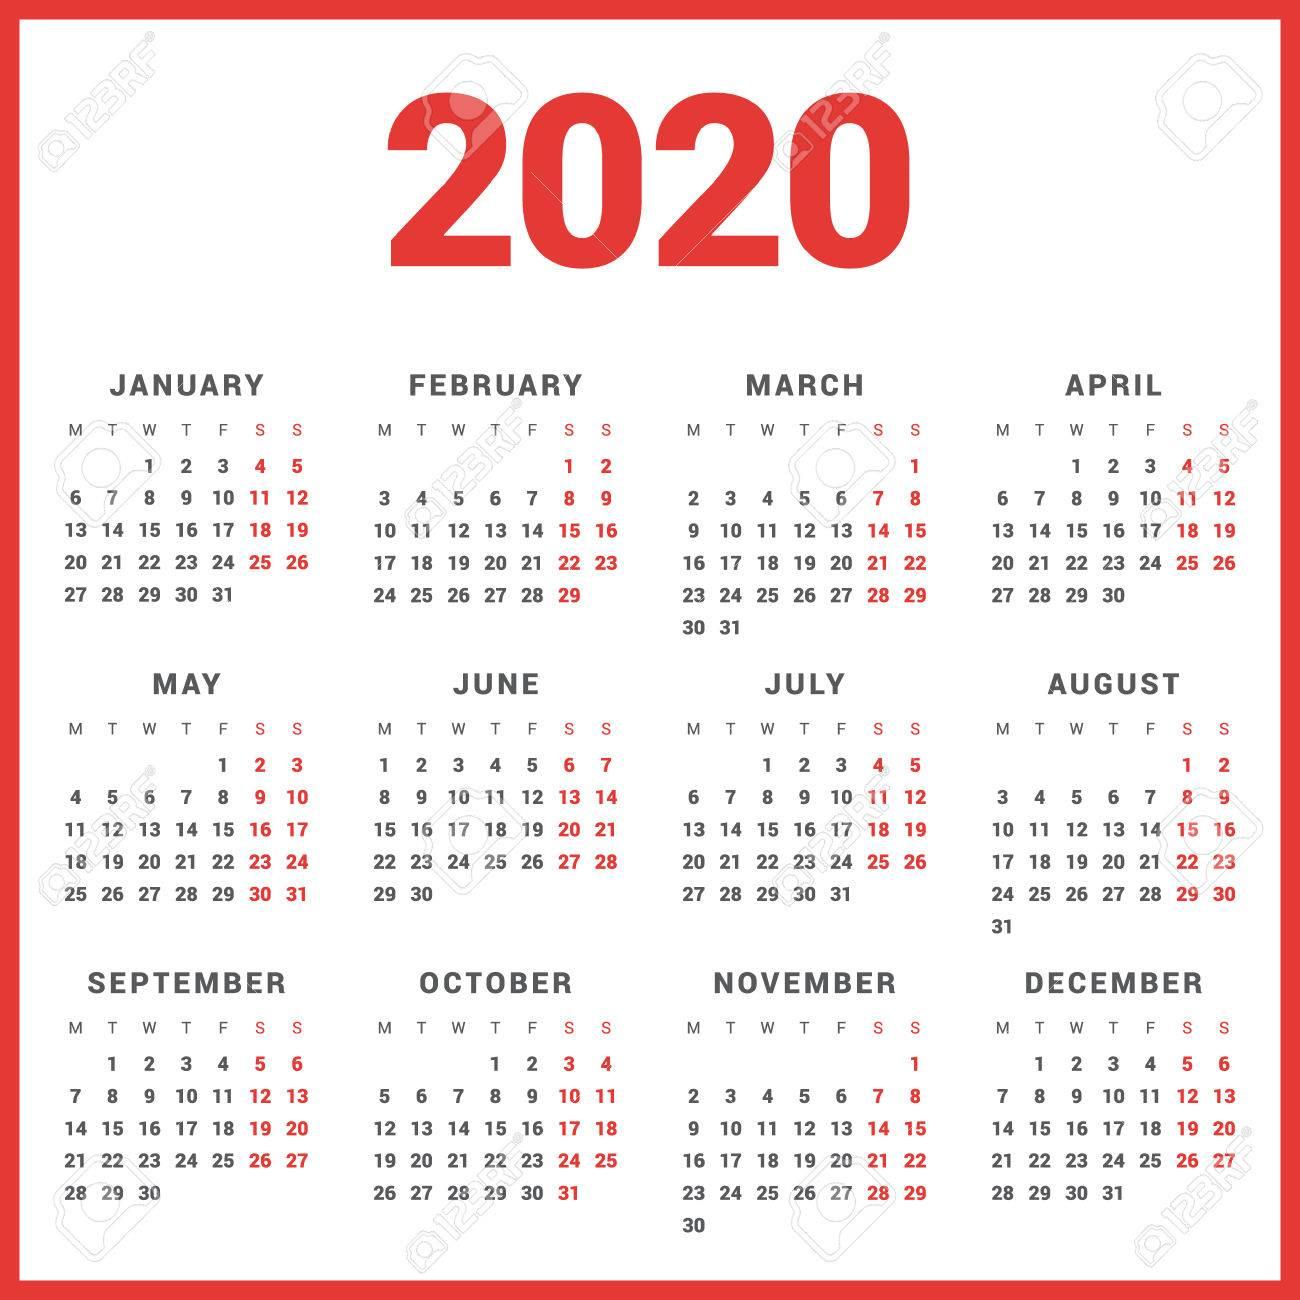 Calendar For 2020 Year On White Background. Week Starts Monday regarding 2020 Calendar Starting On Monday